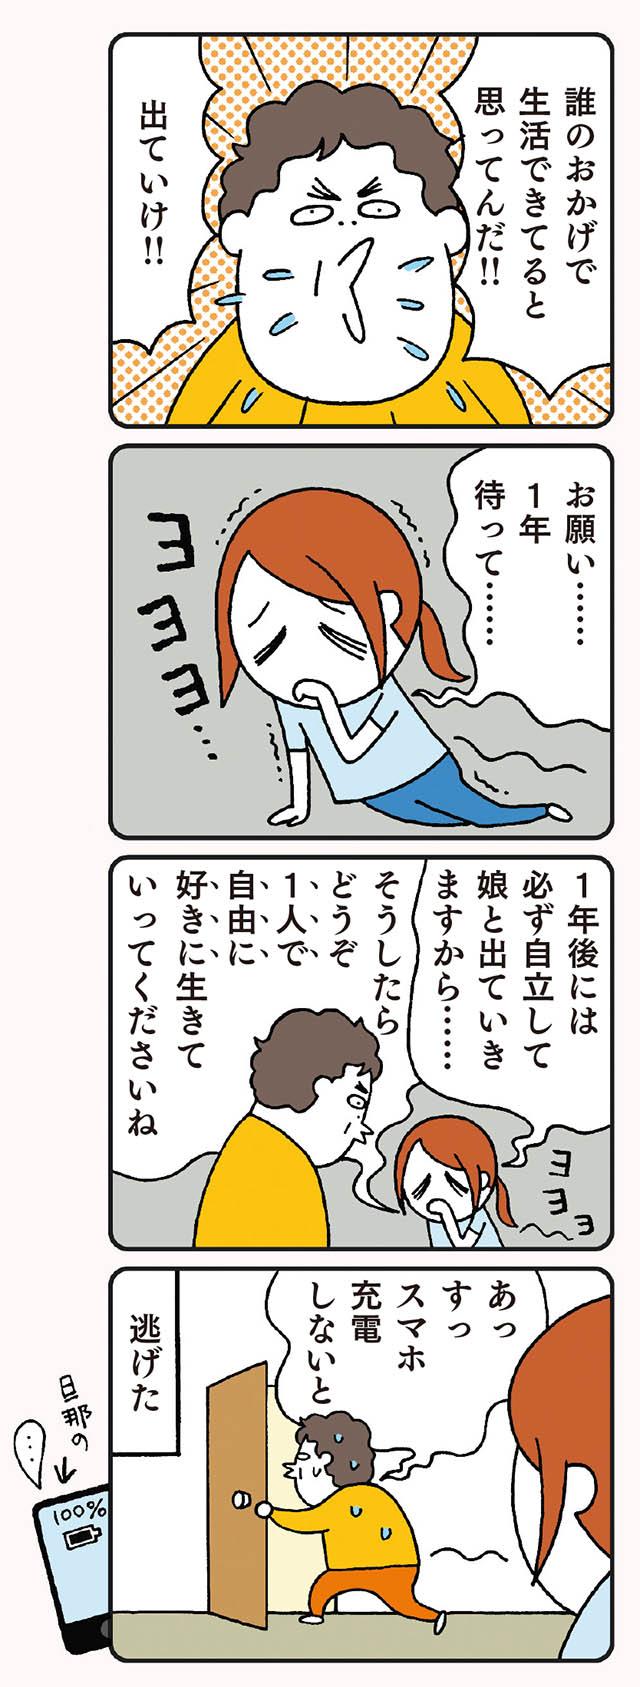 morahara-danna-22.jpg